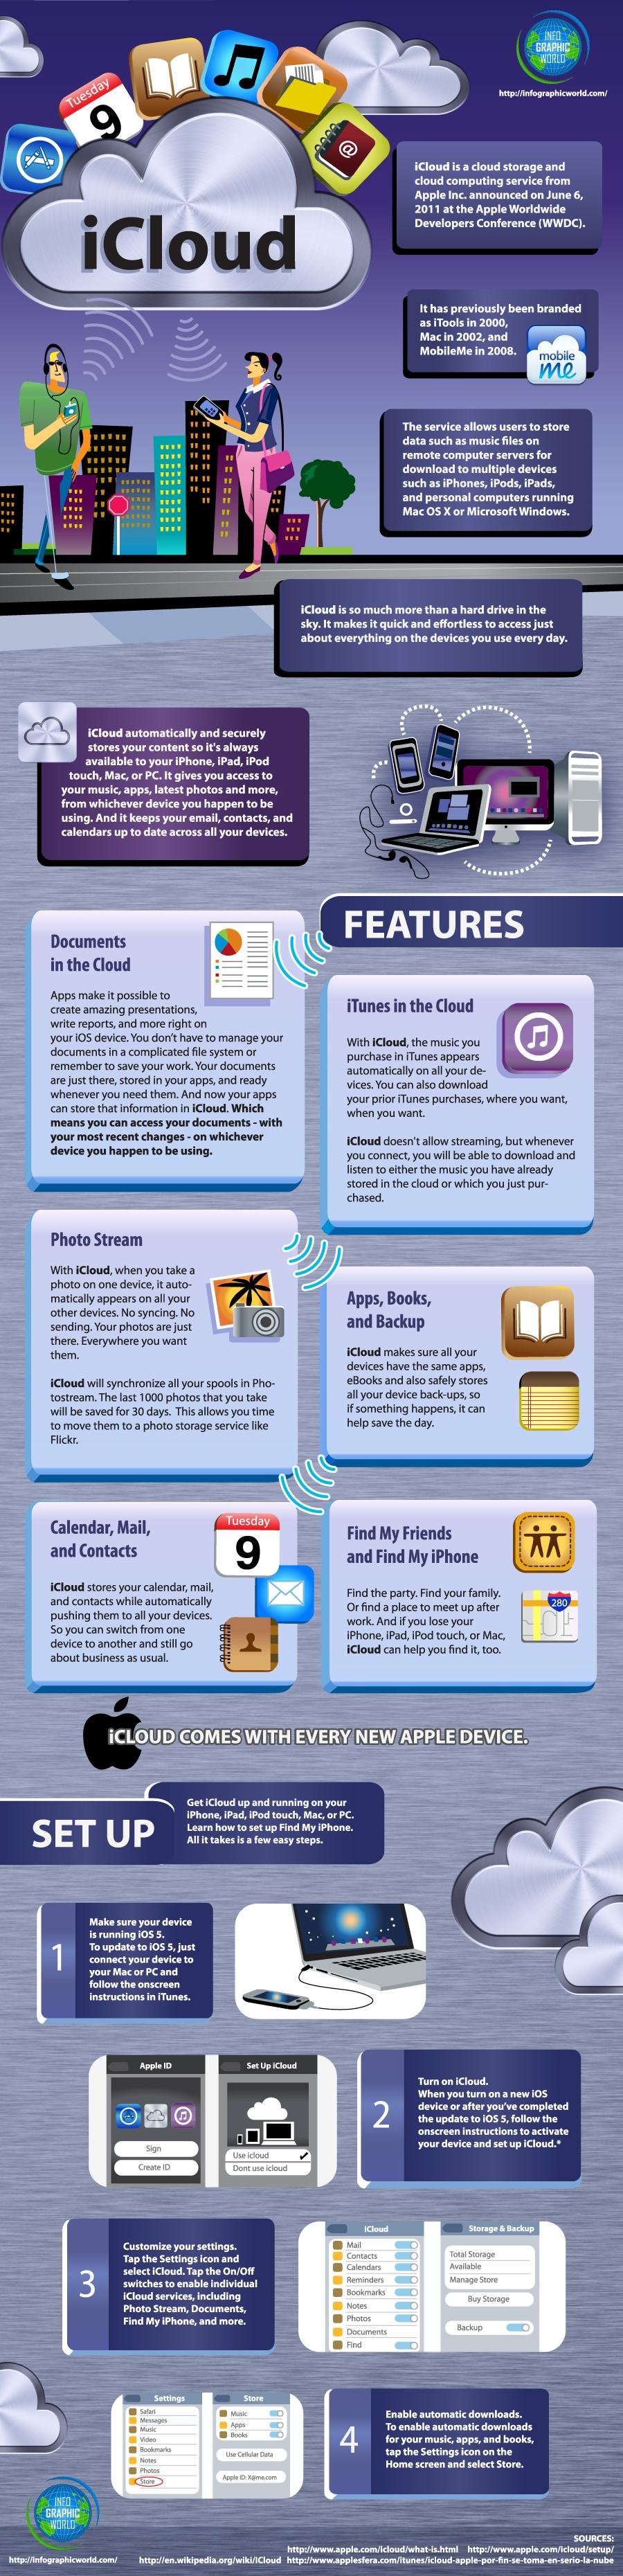 iCloud V2 11.3 - iCloud Infographic – What is iCloud?